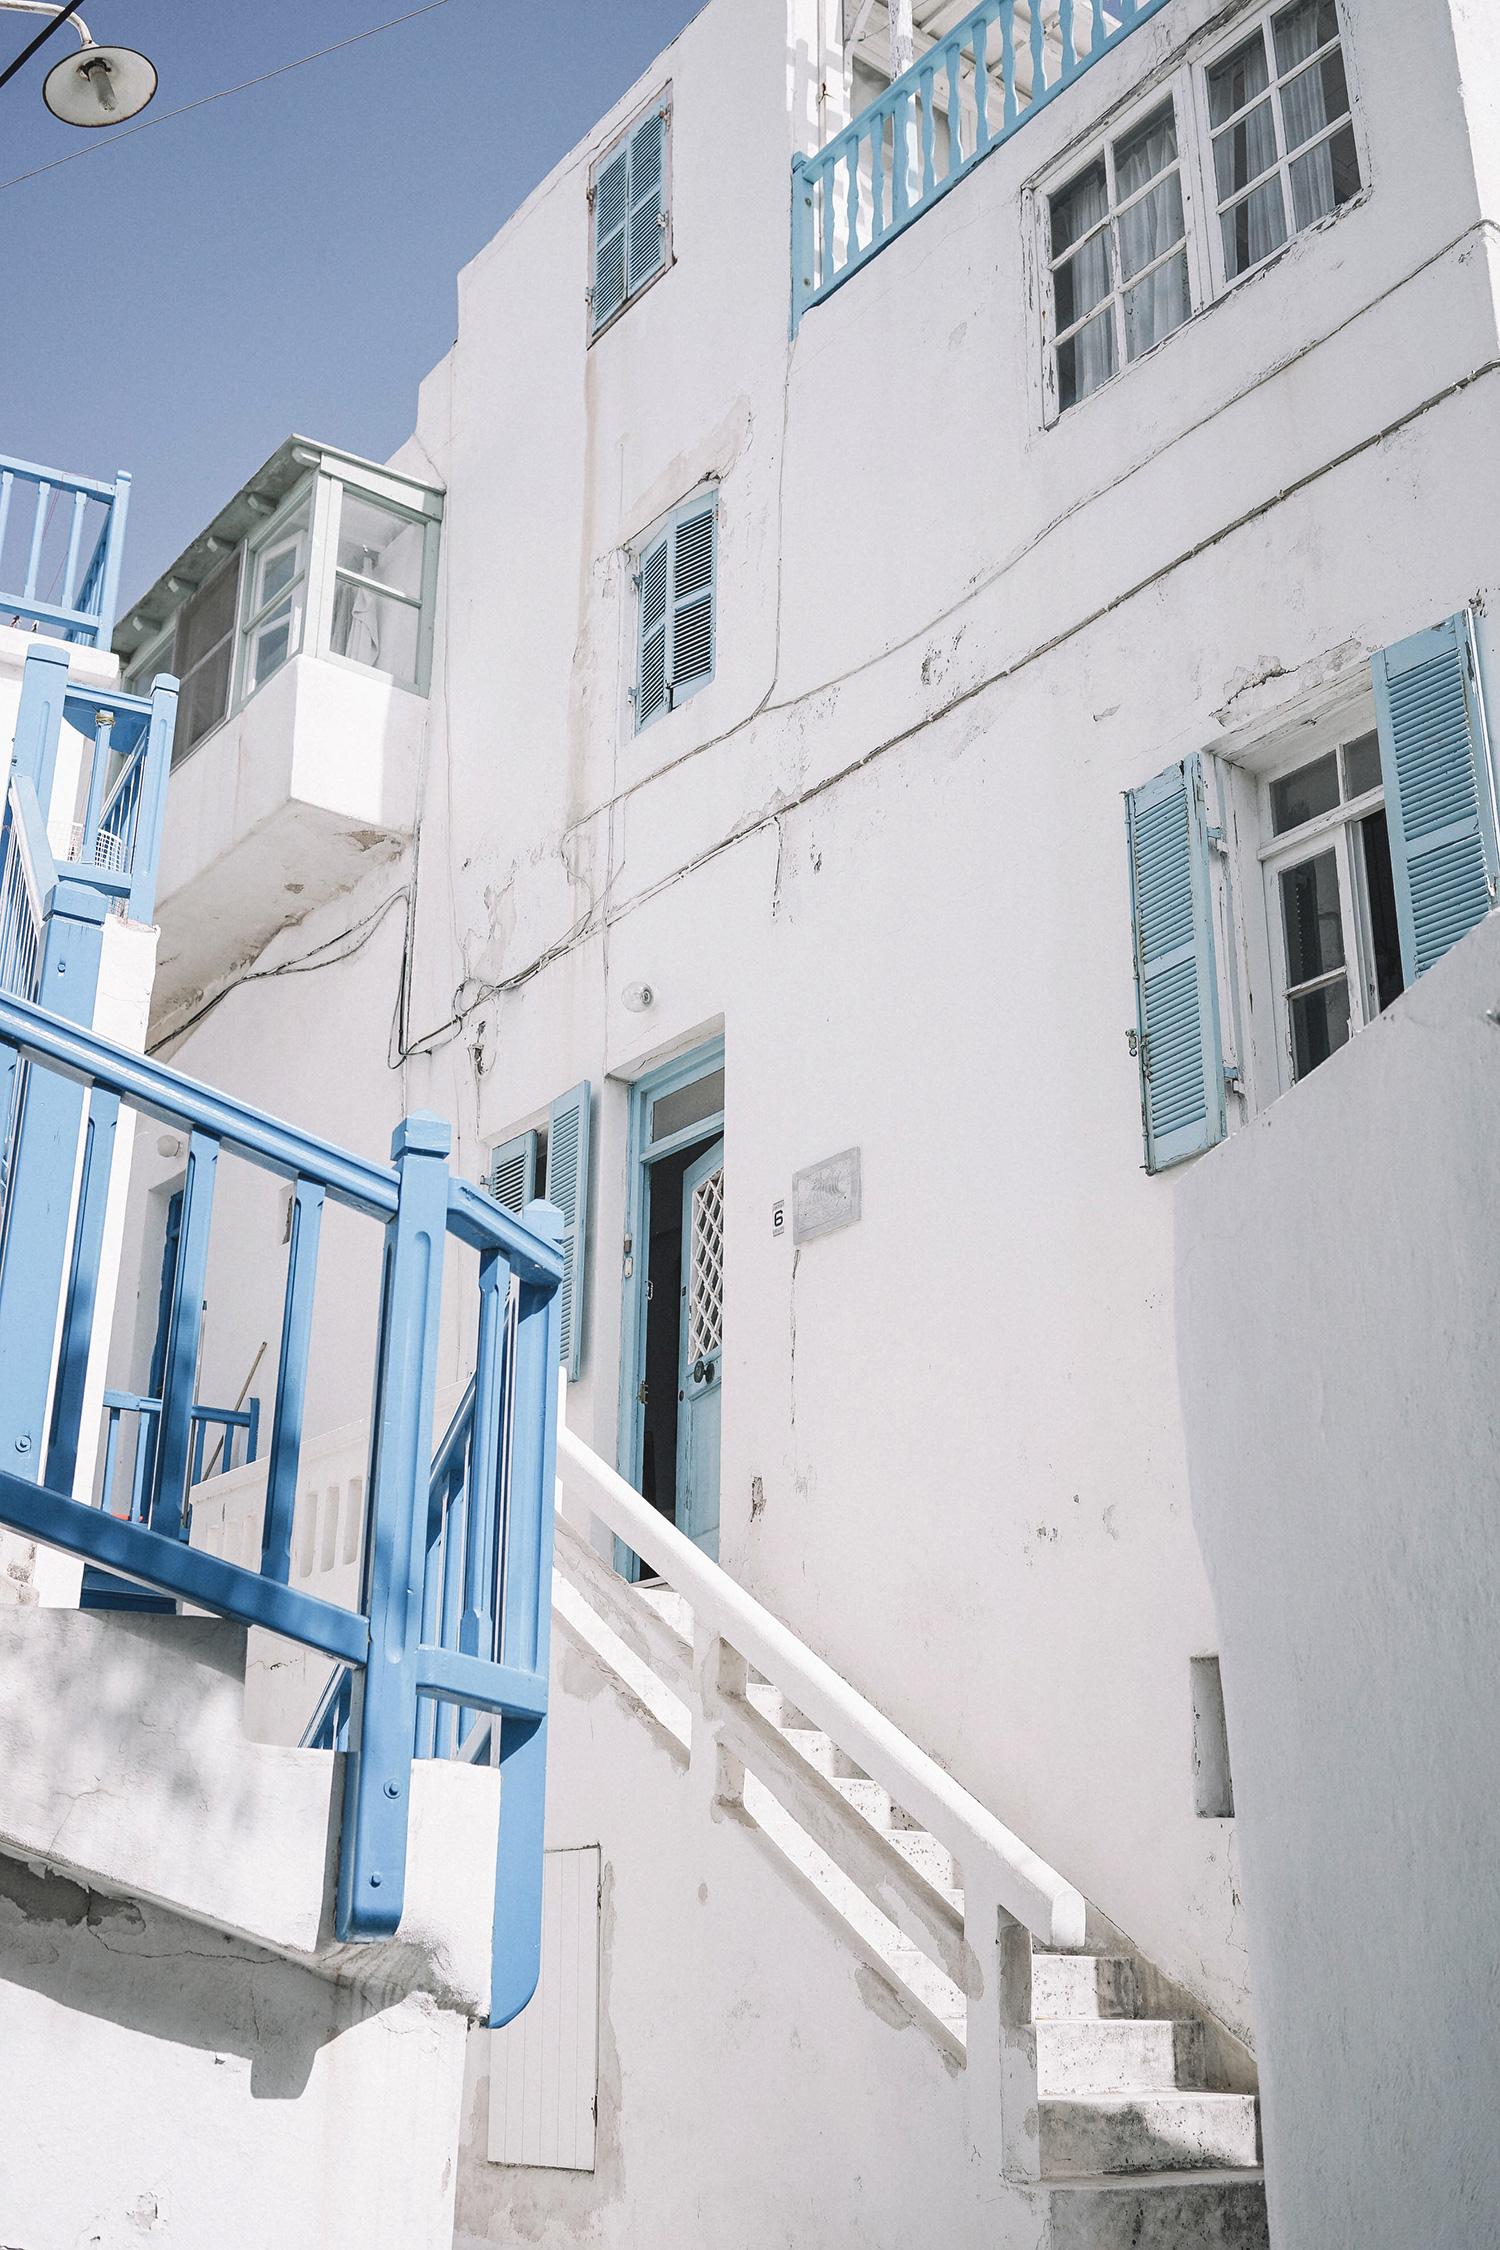 Lace_up_Blouse-Ralph_Lauren-Soludos_Espadrilles-Soludos_Escapes-Skirt-Straw_Hat-Canotier-Lack_Of_Color-Street_Style-Mykonos-Greece-Collage_Vintage-111